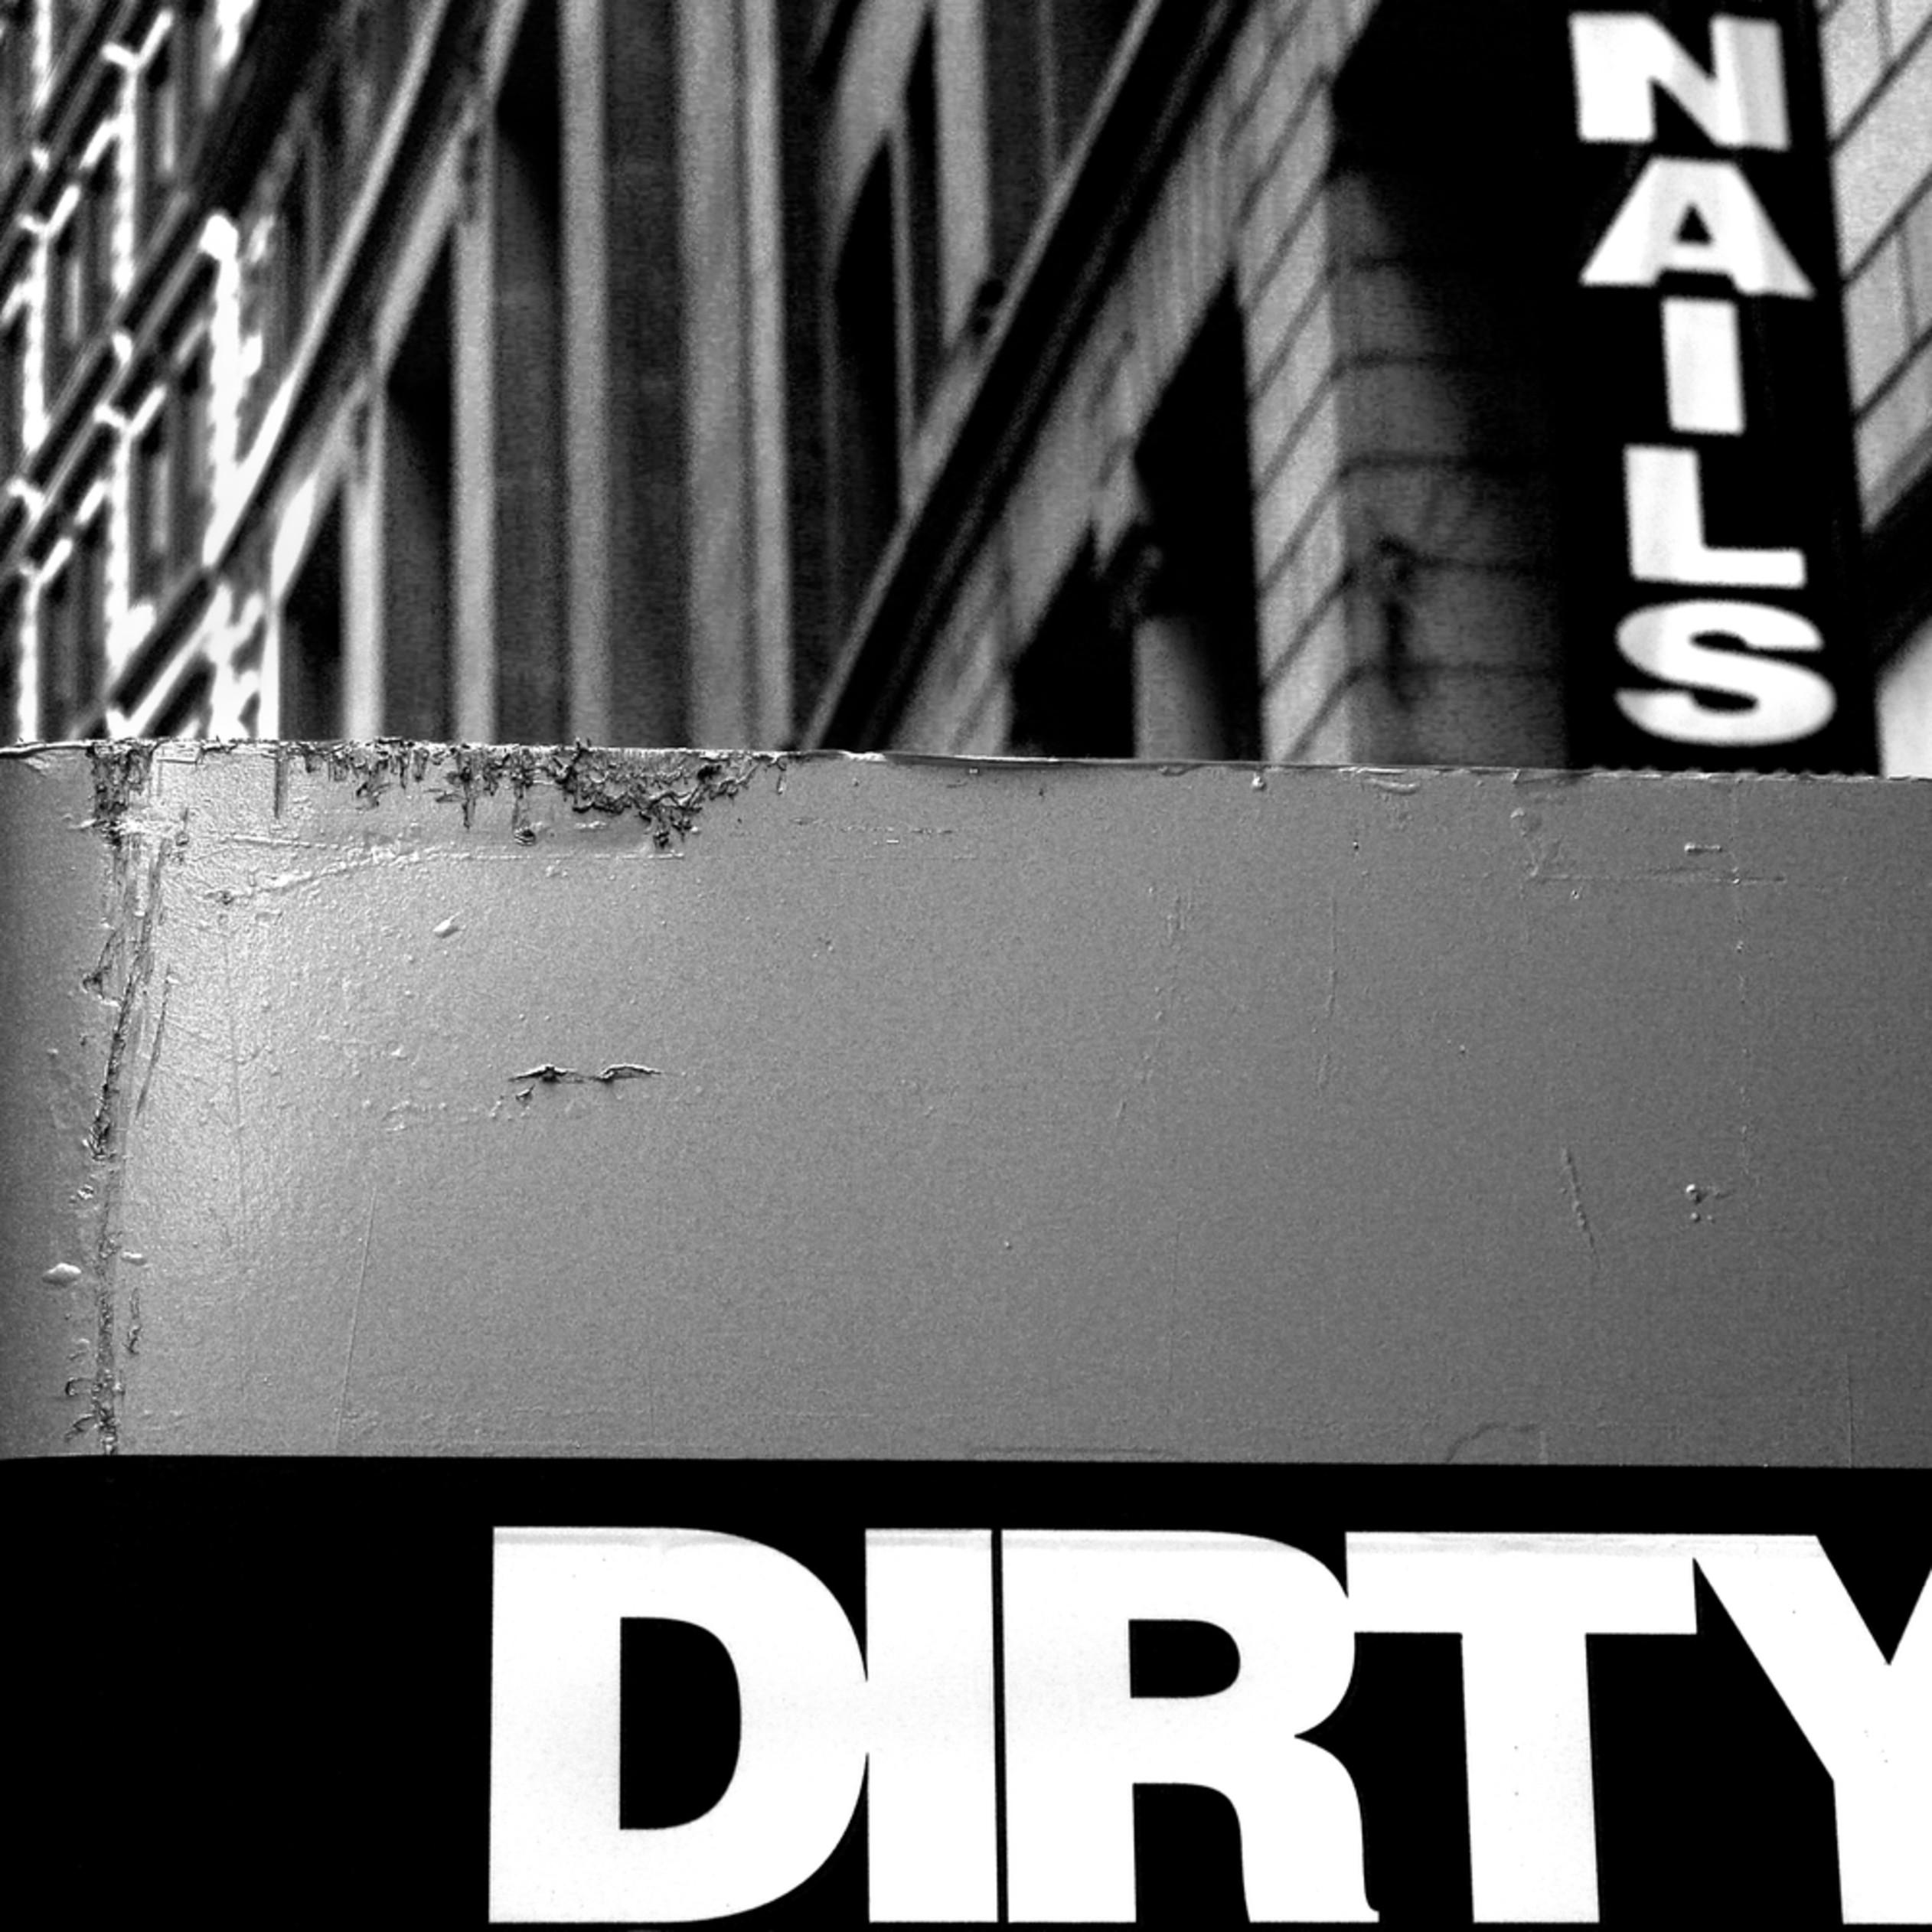 Dirty nails rcyiai